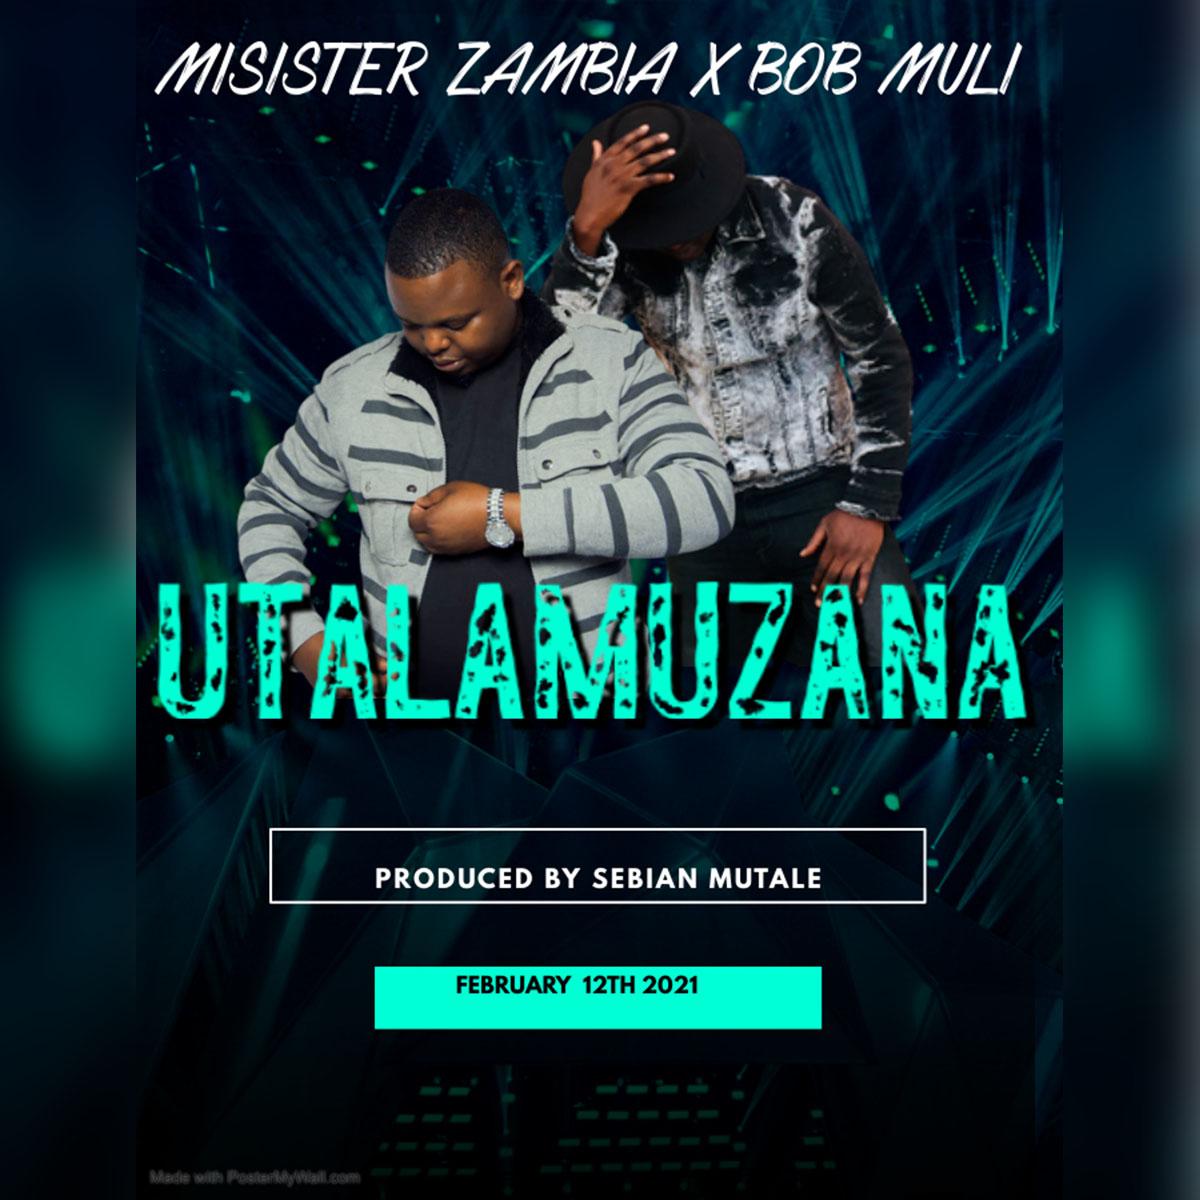 Misistar Zambia ft. Bob Muli - Utalamuzana